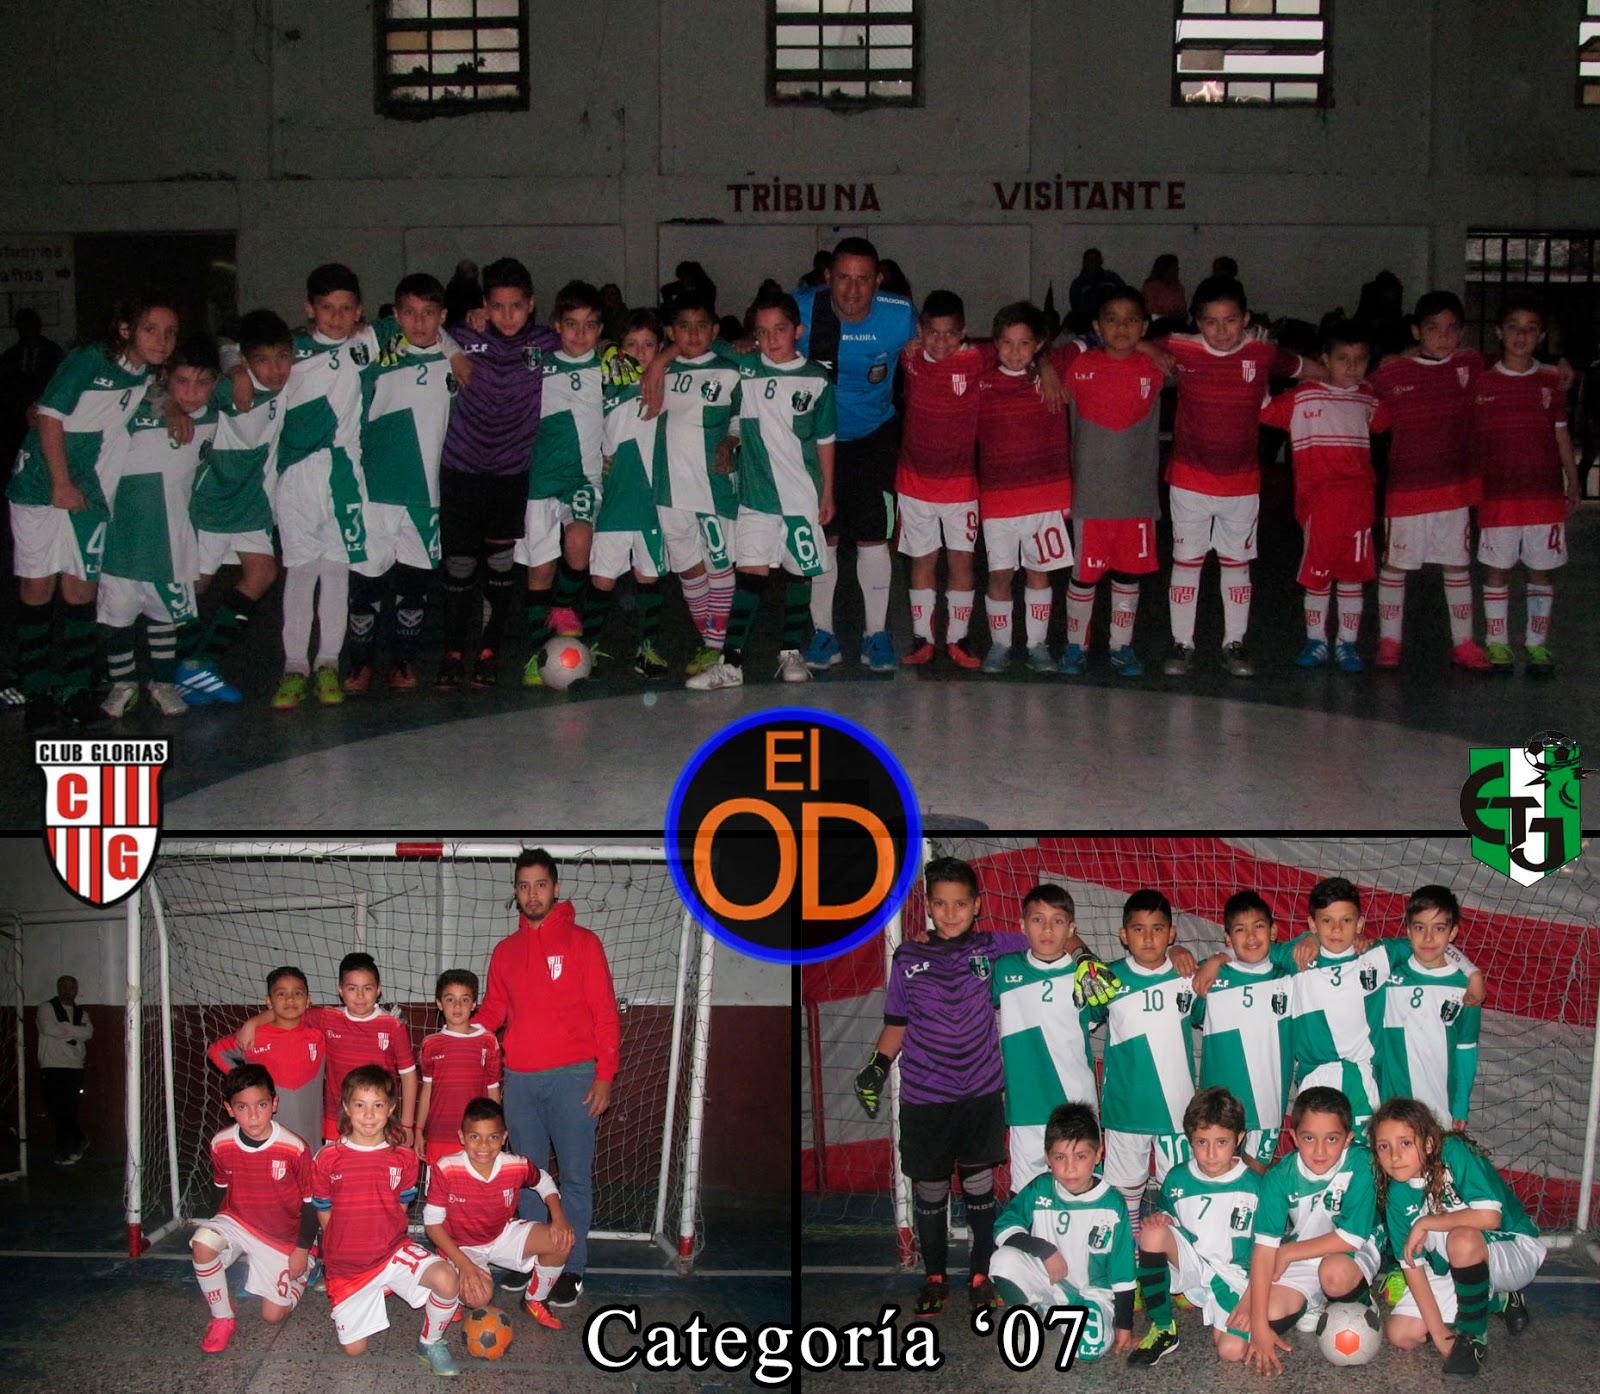 El Olimpo 2016: ACT - Fecha 18A: Glorias c. Talar Jrs 2007